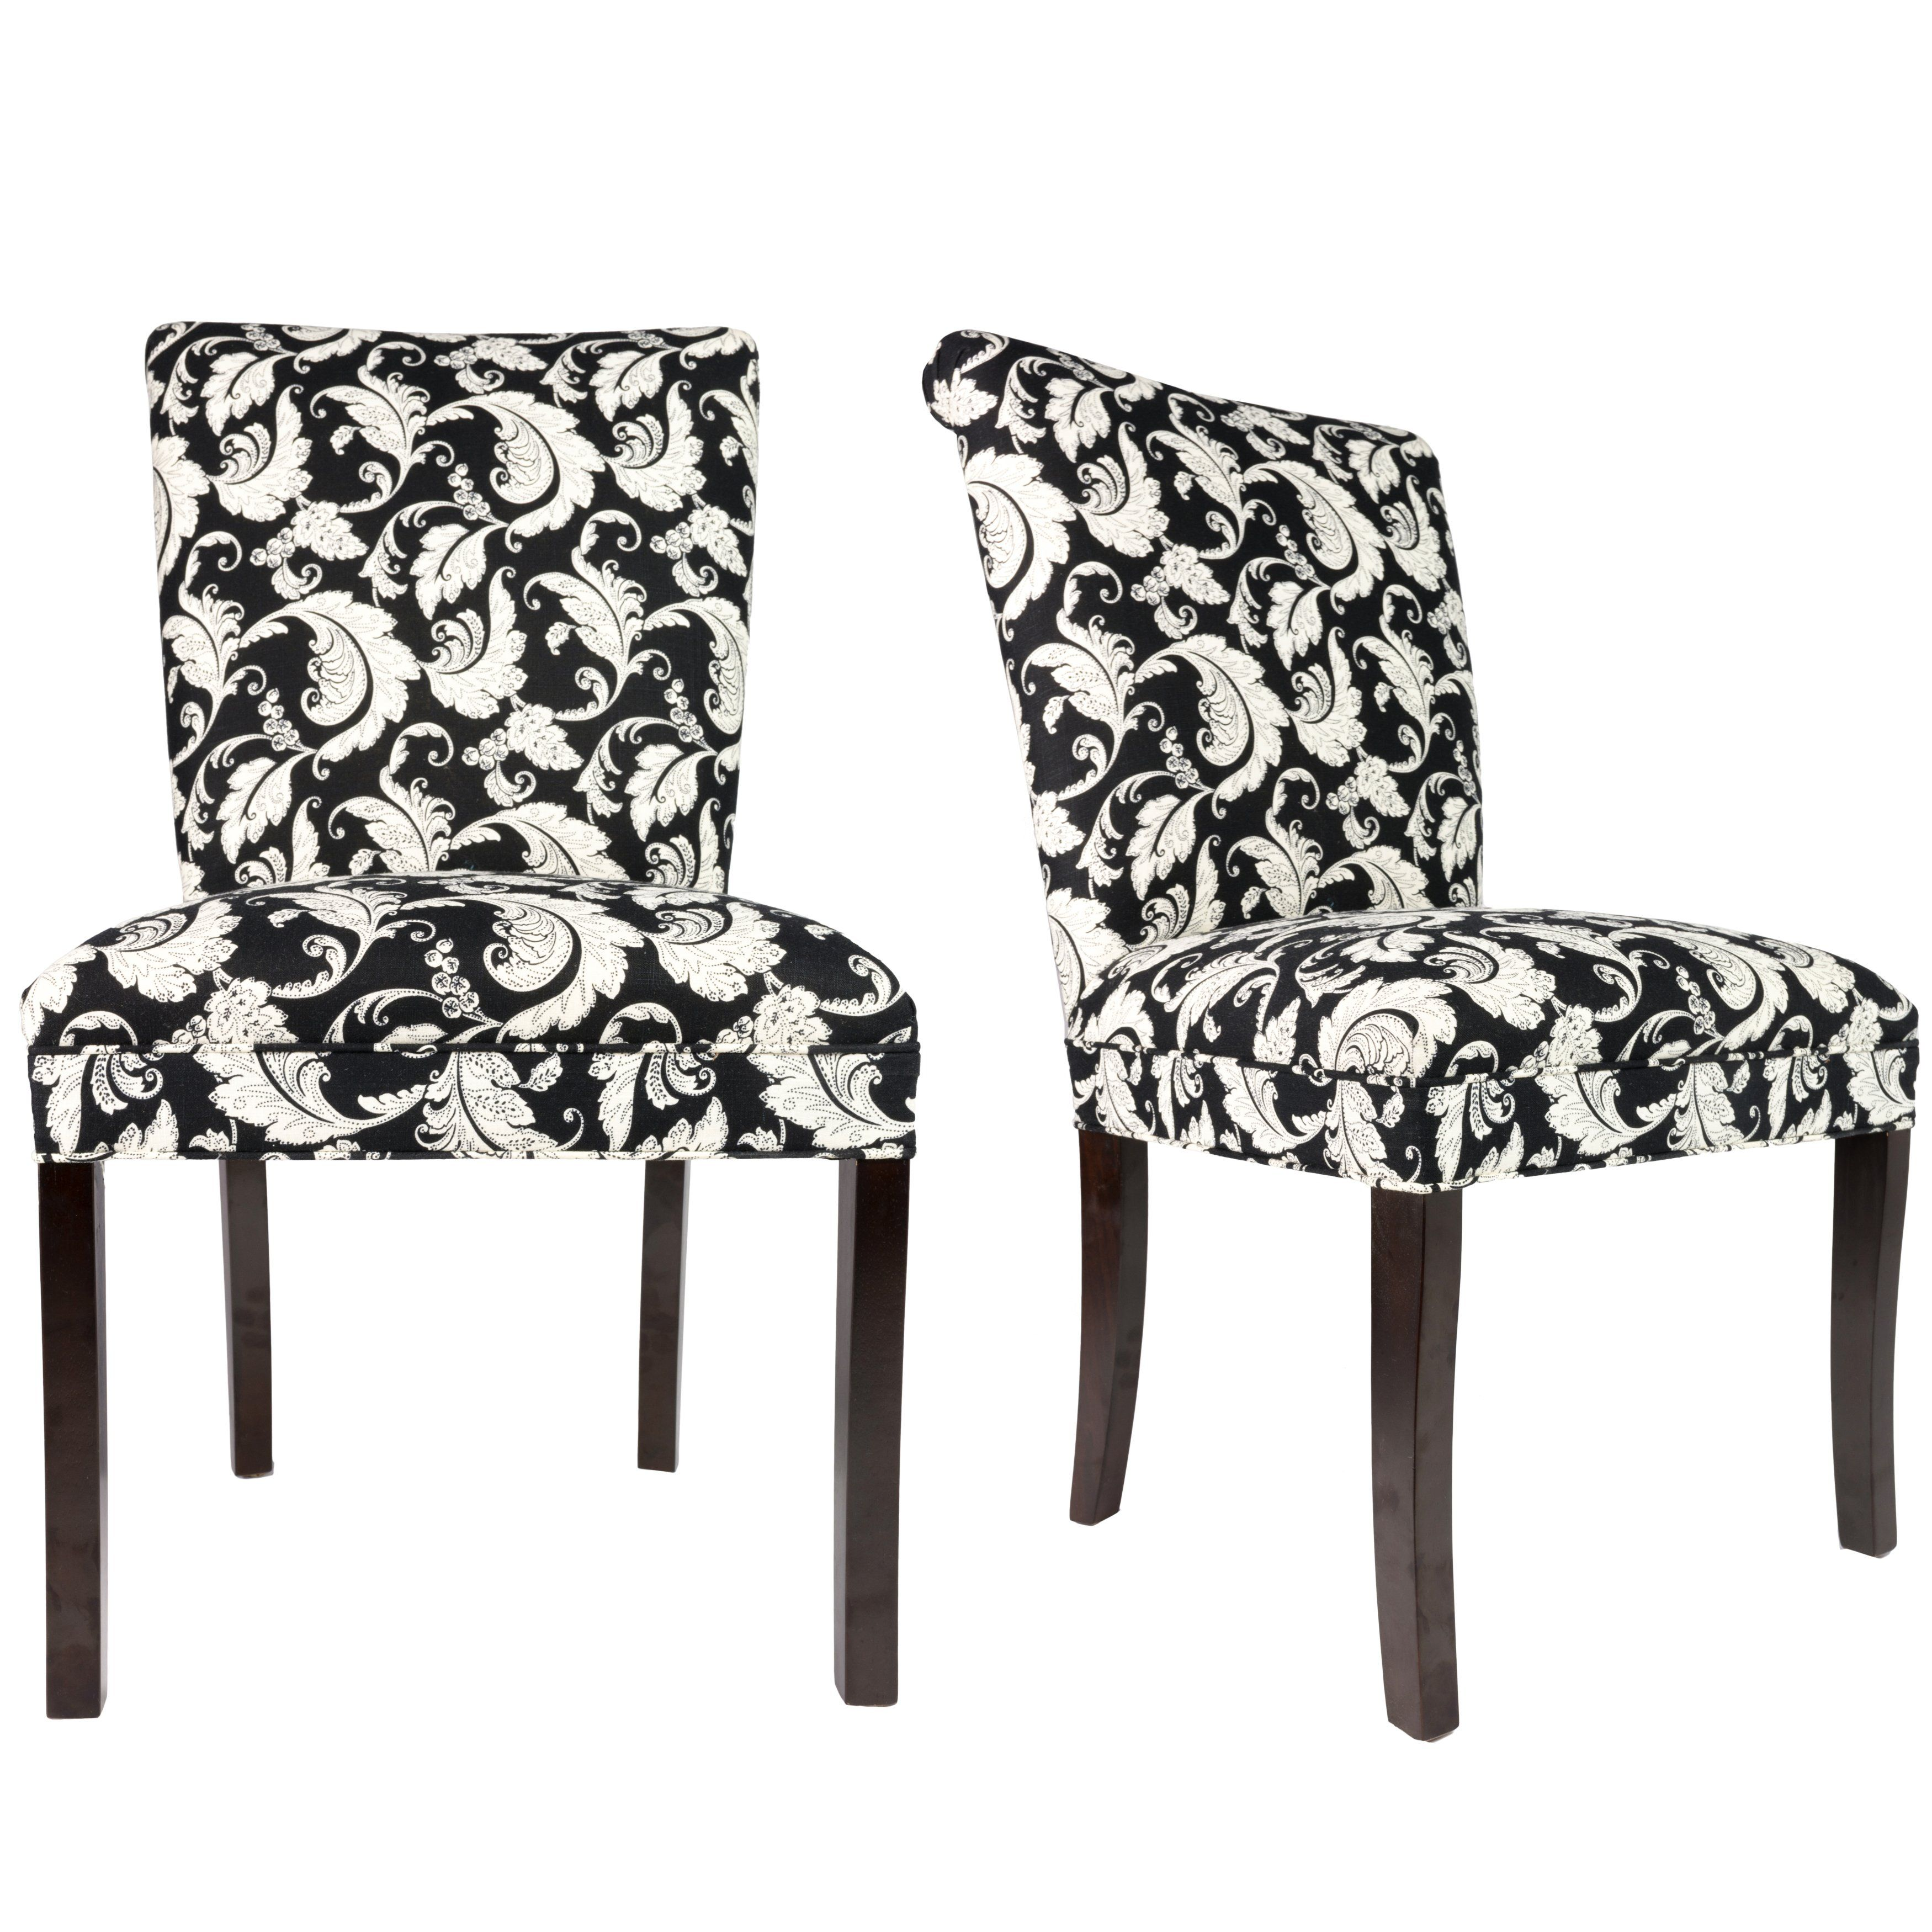 Sohle Stuhl Designs Mit Bildern Stuhl Design Esszimmerstuhle Stuhle